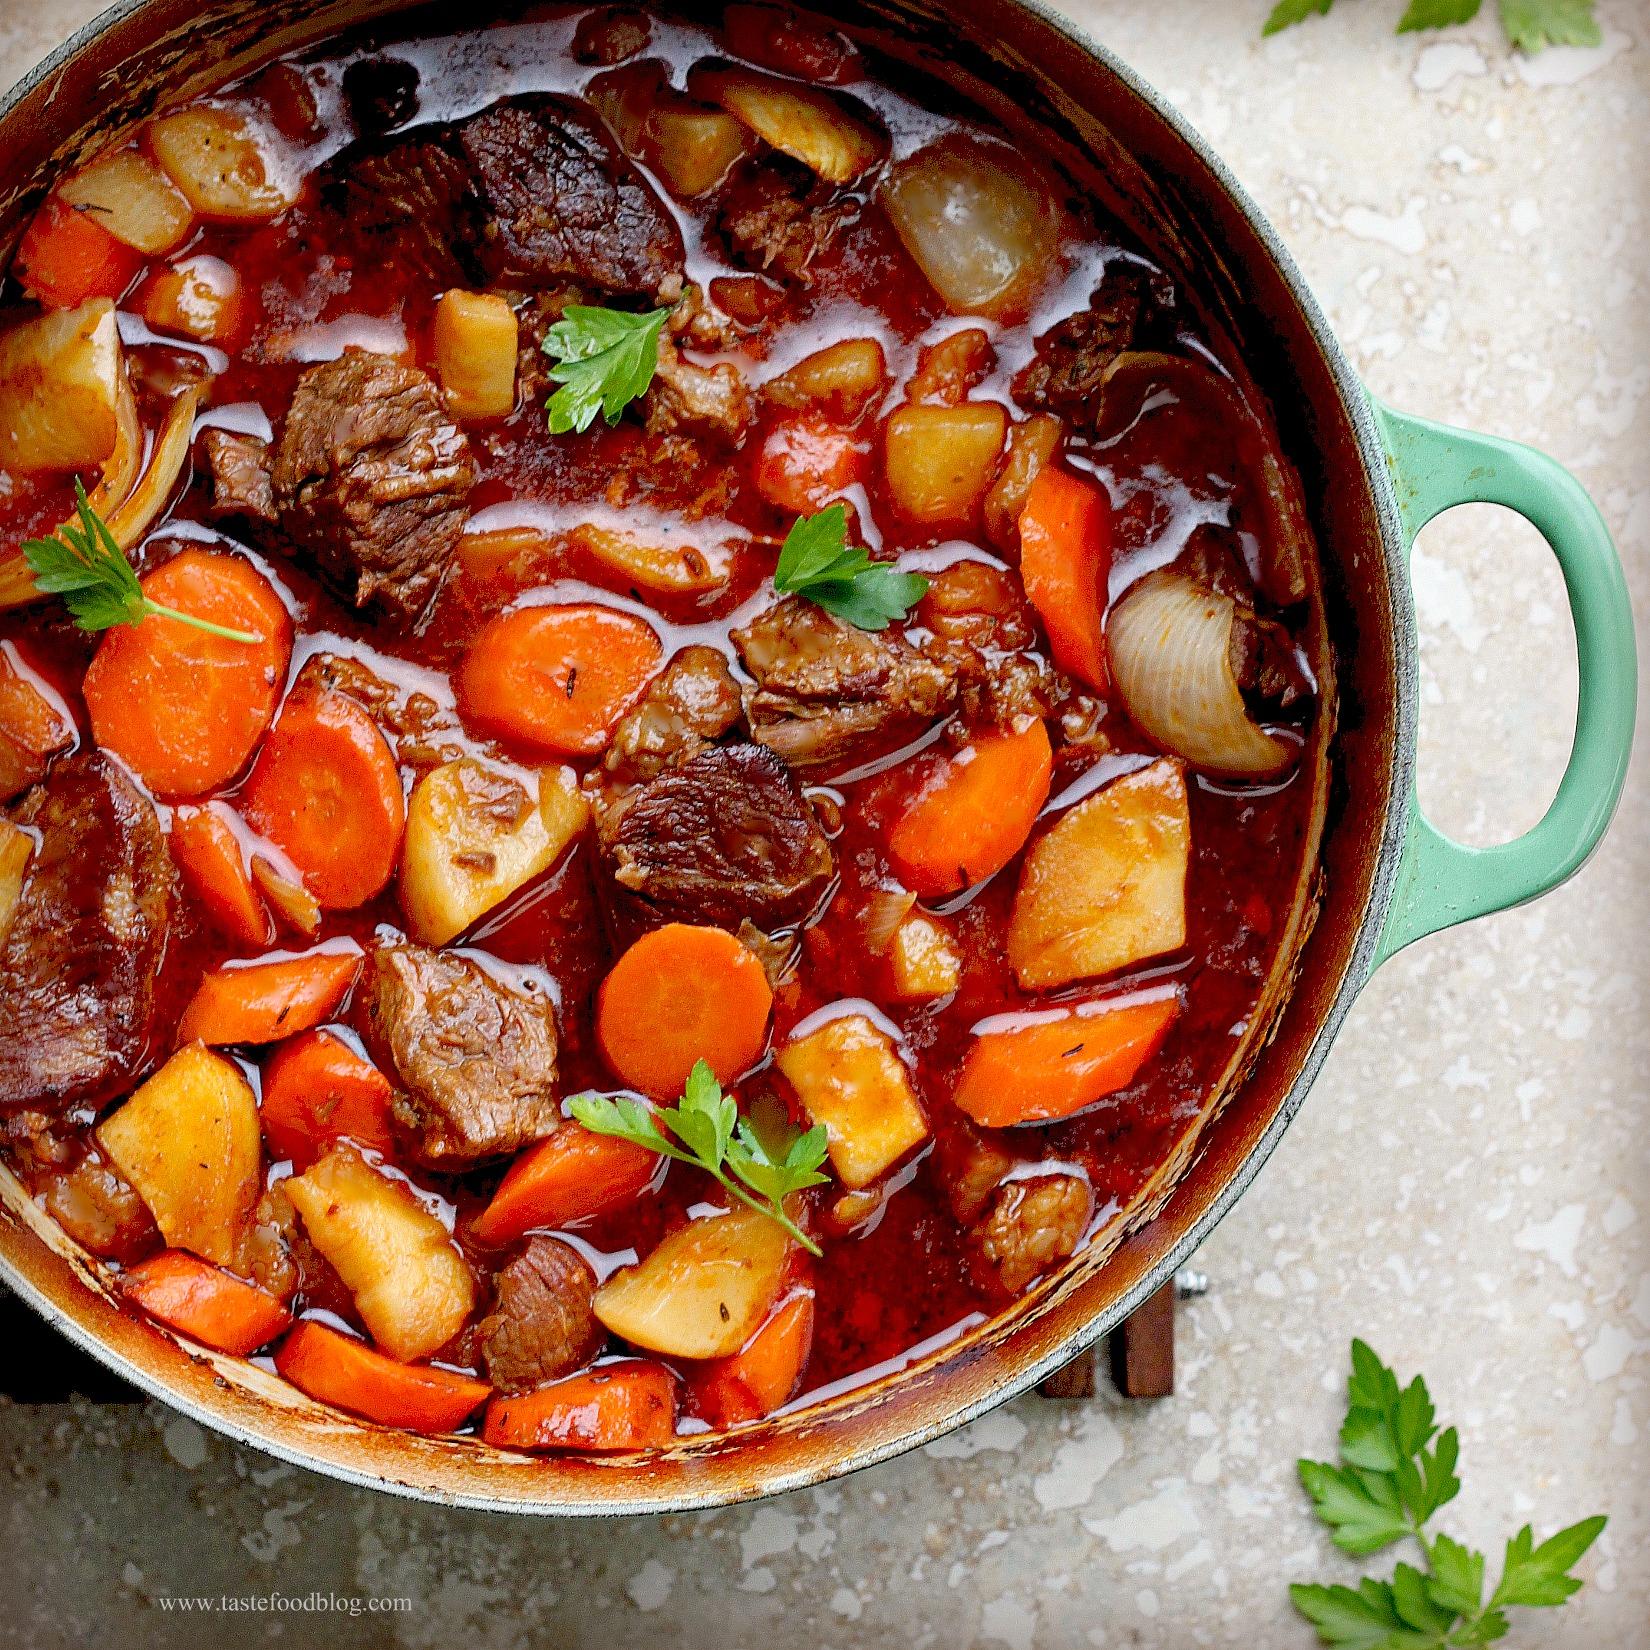 irish stew tf2